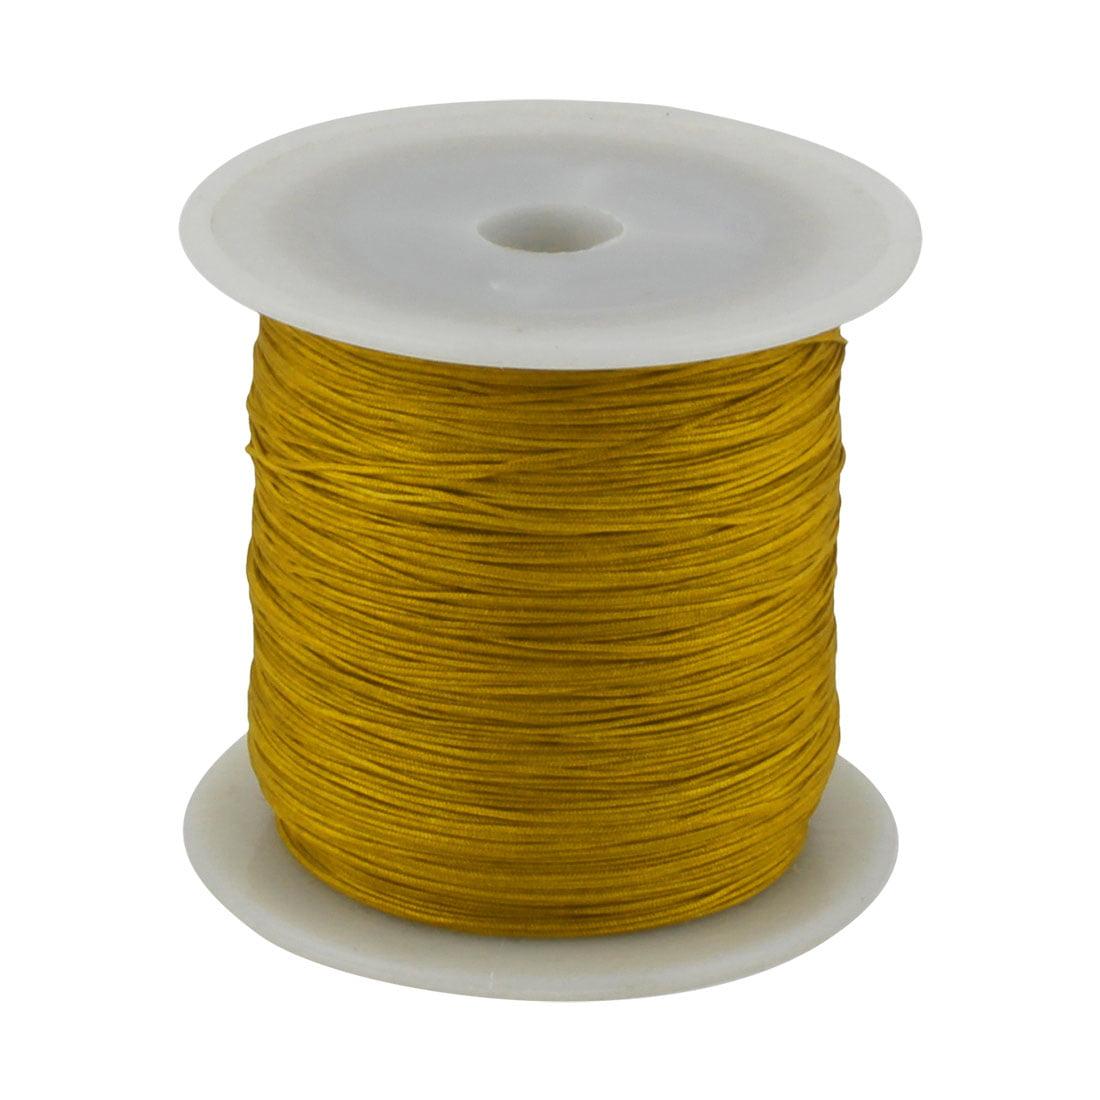 Home Nylon DIY Art Craft Braided Chinese Knot Cord String Rope Khaki 153 Yards